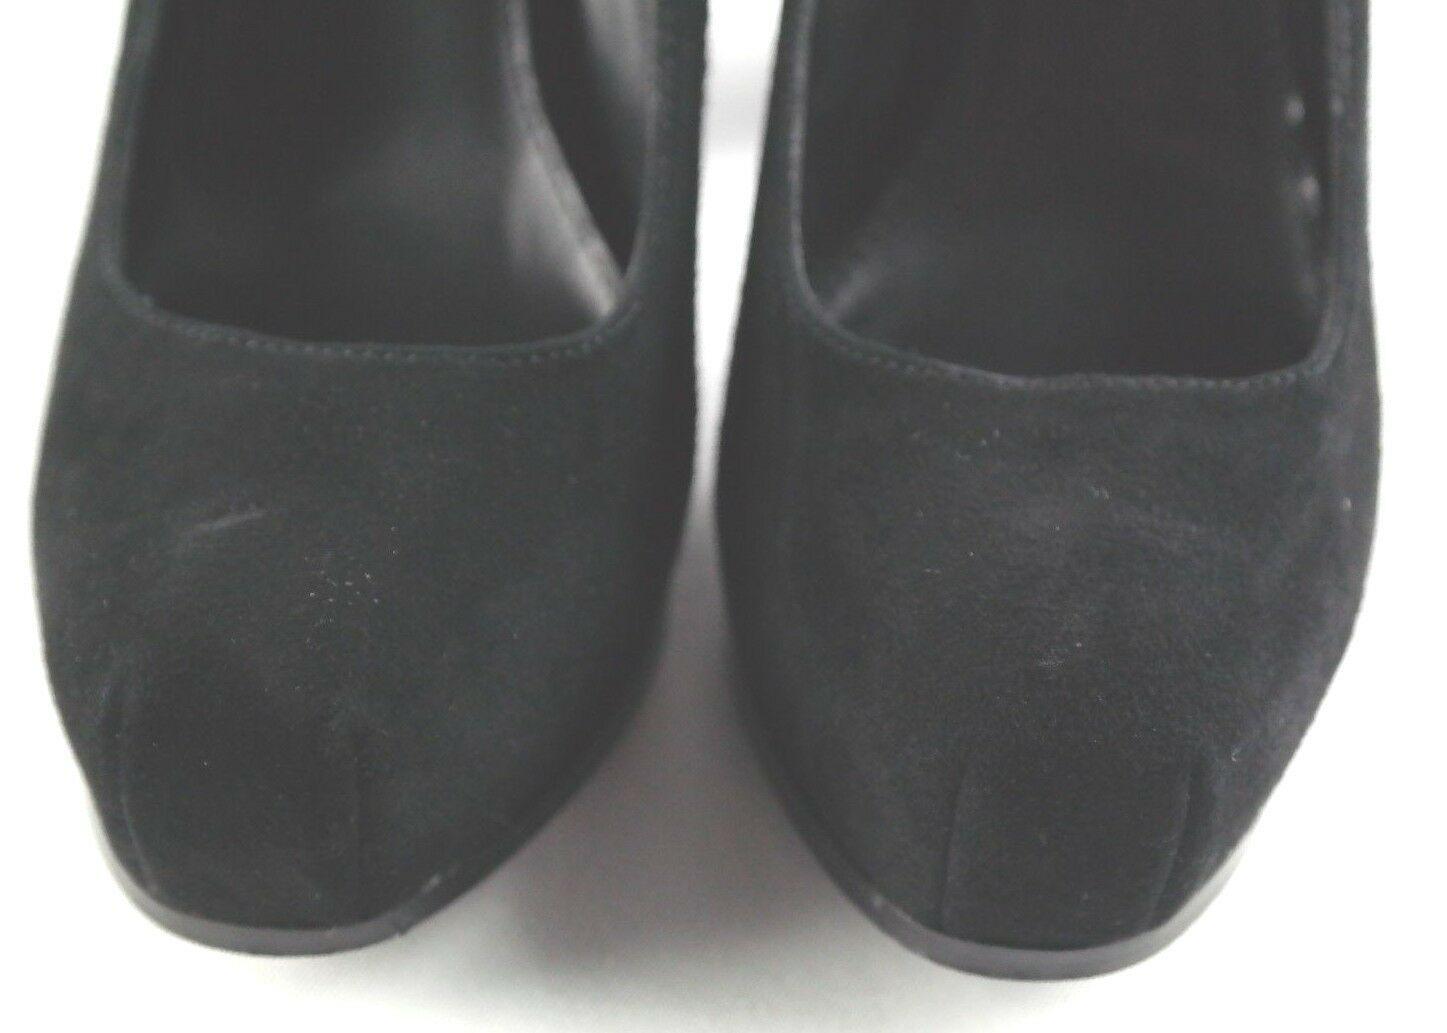 Steve Madden Sarrina Platform Pumps Womens Sz 7.5 Black Suede High Heel Shoes image 10